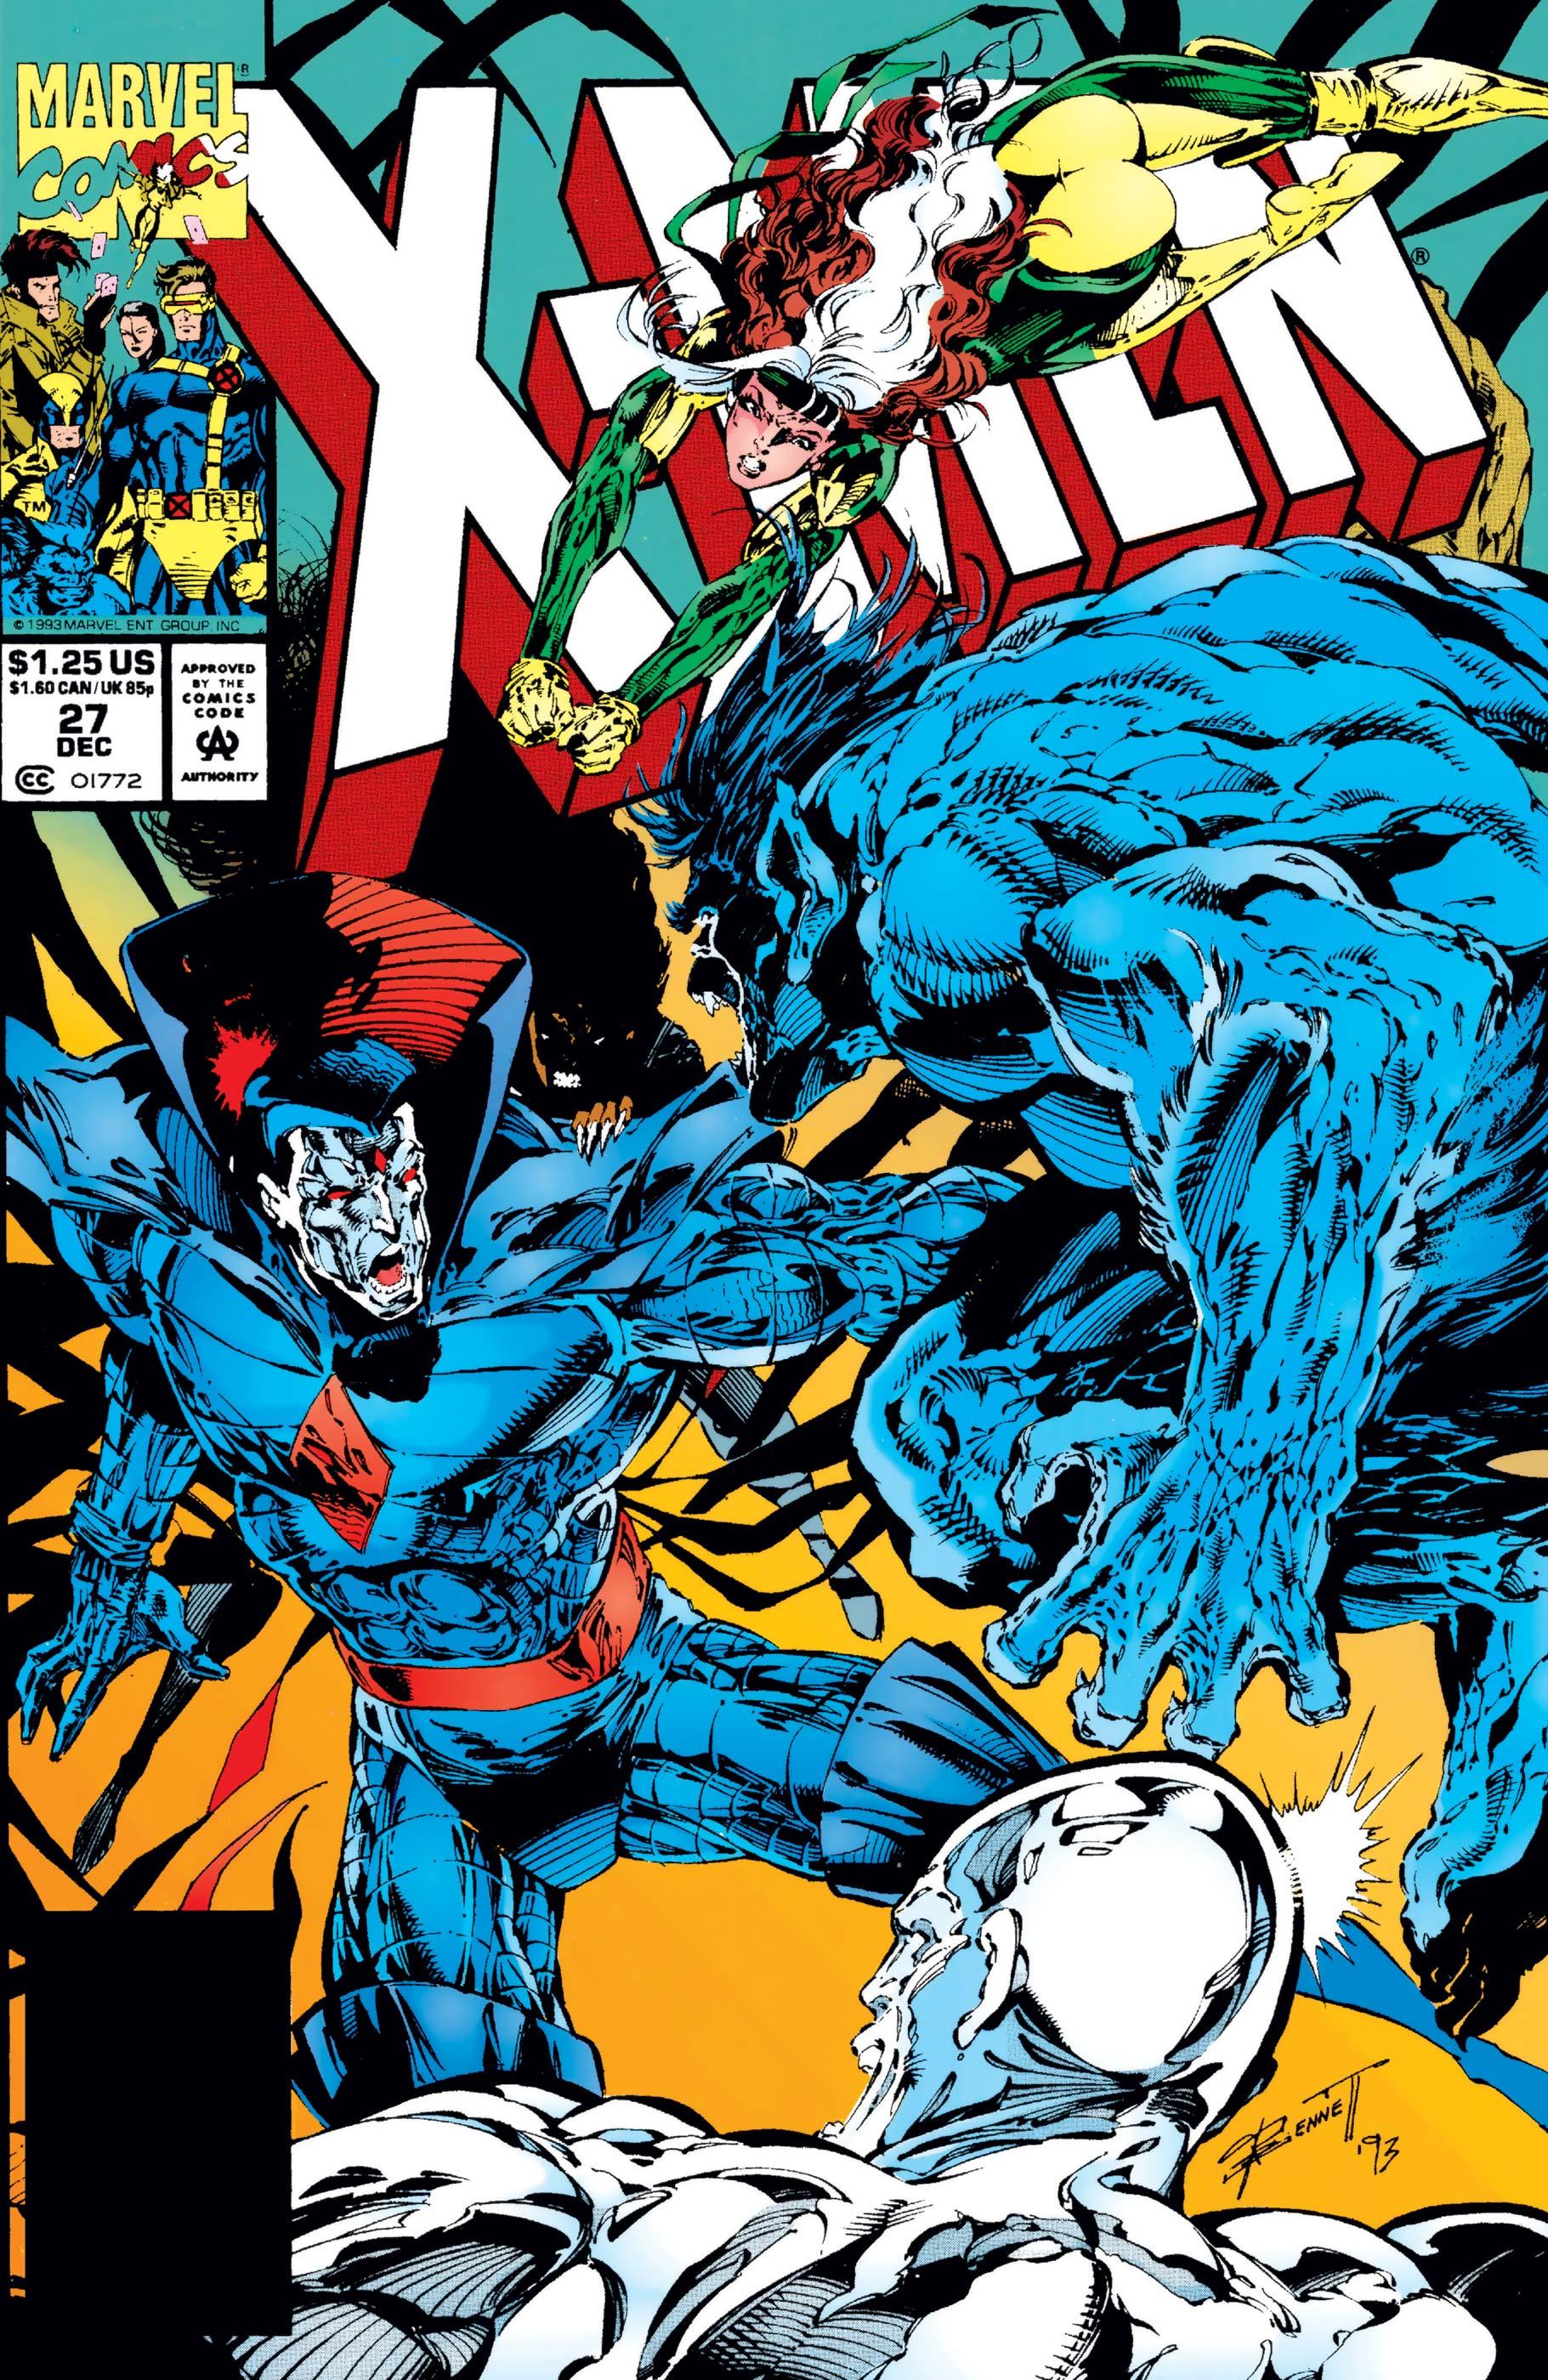 X-Men (1991) #27